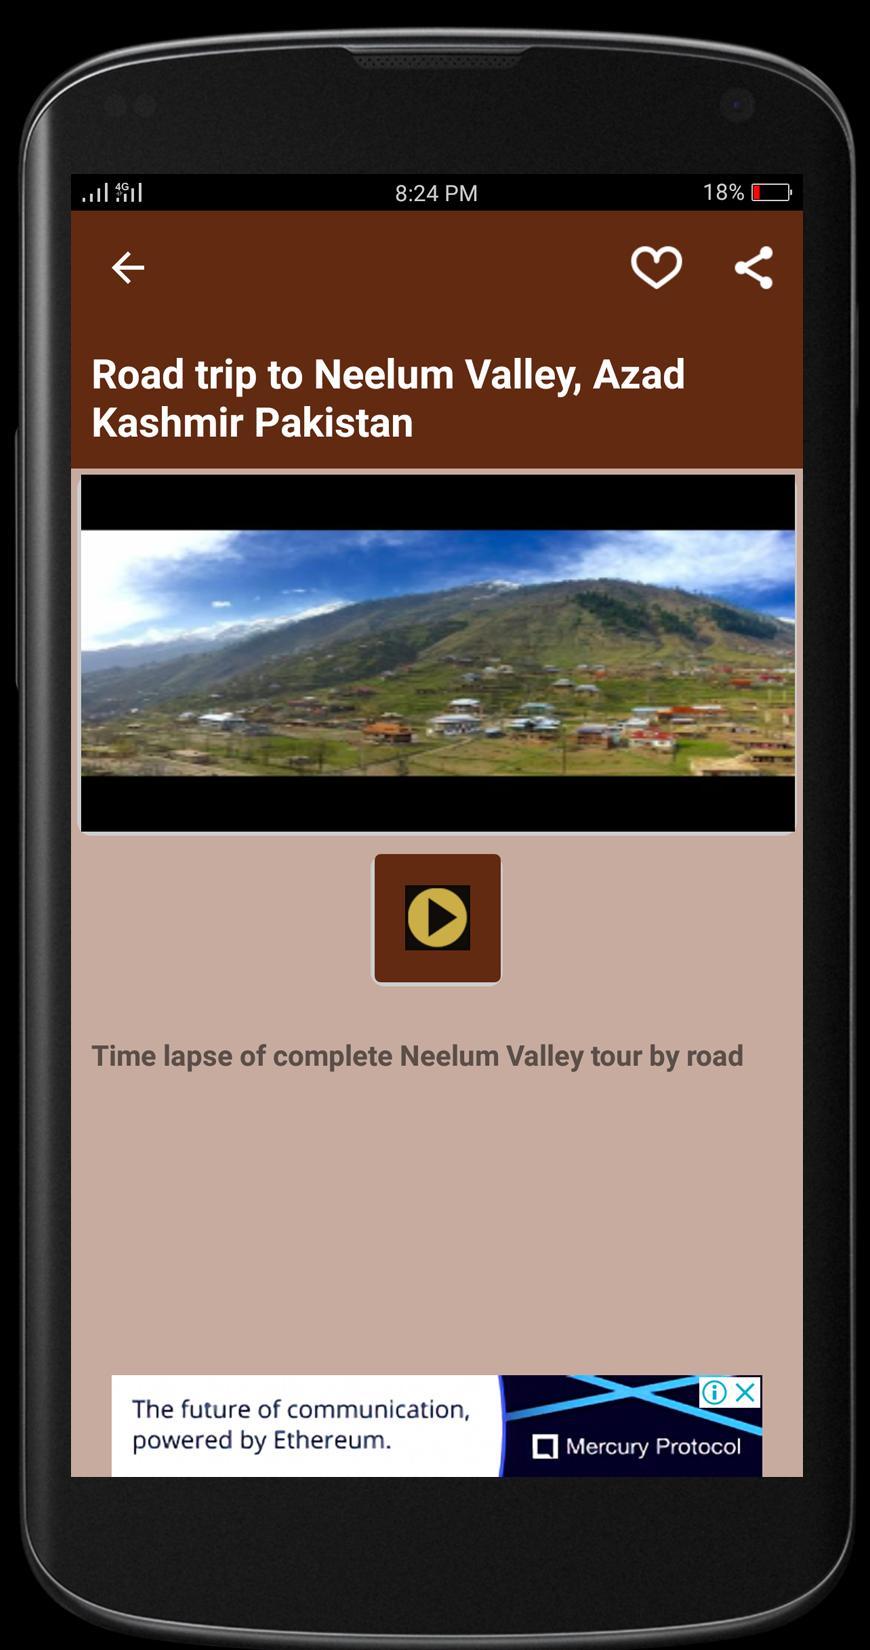 Kashmir Tourism poster